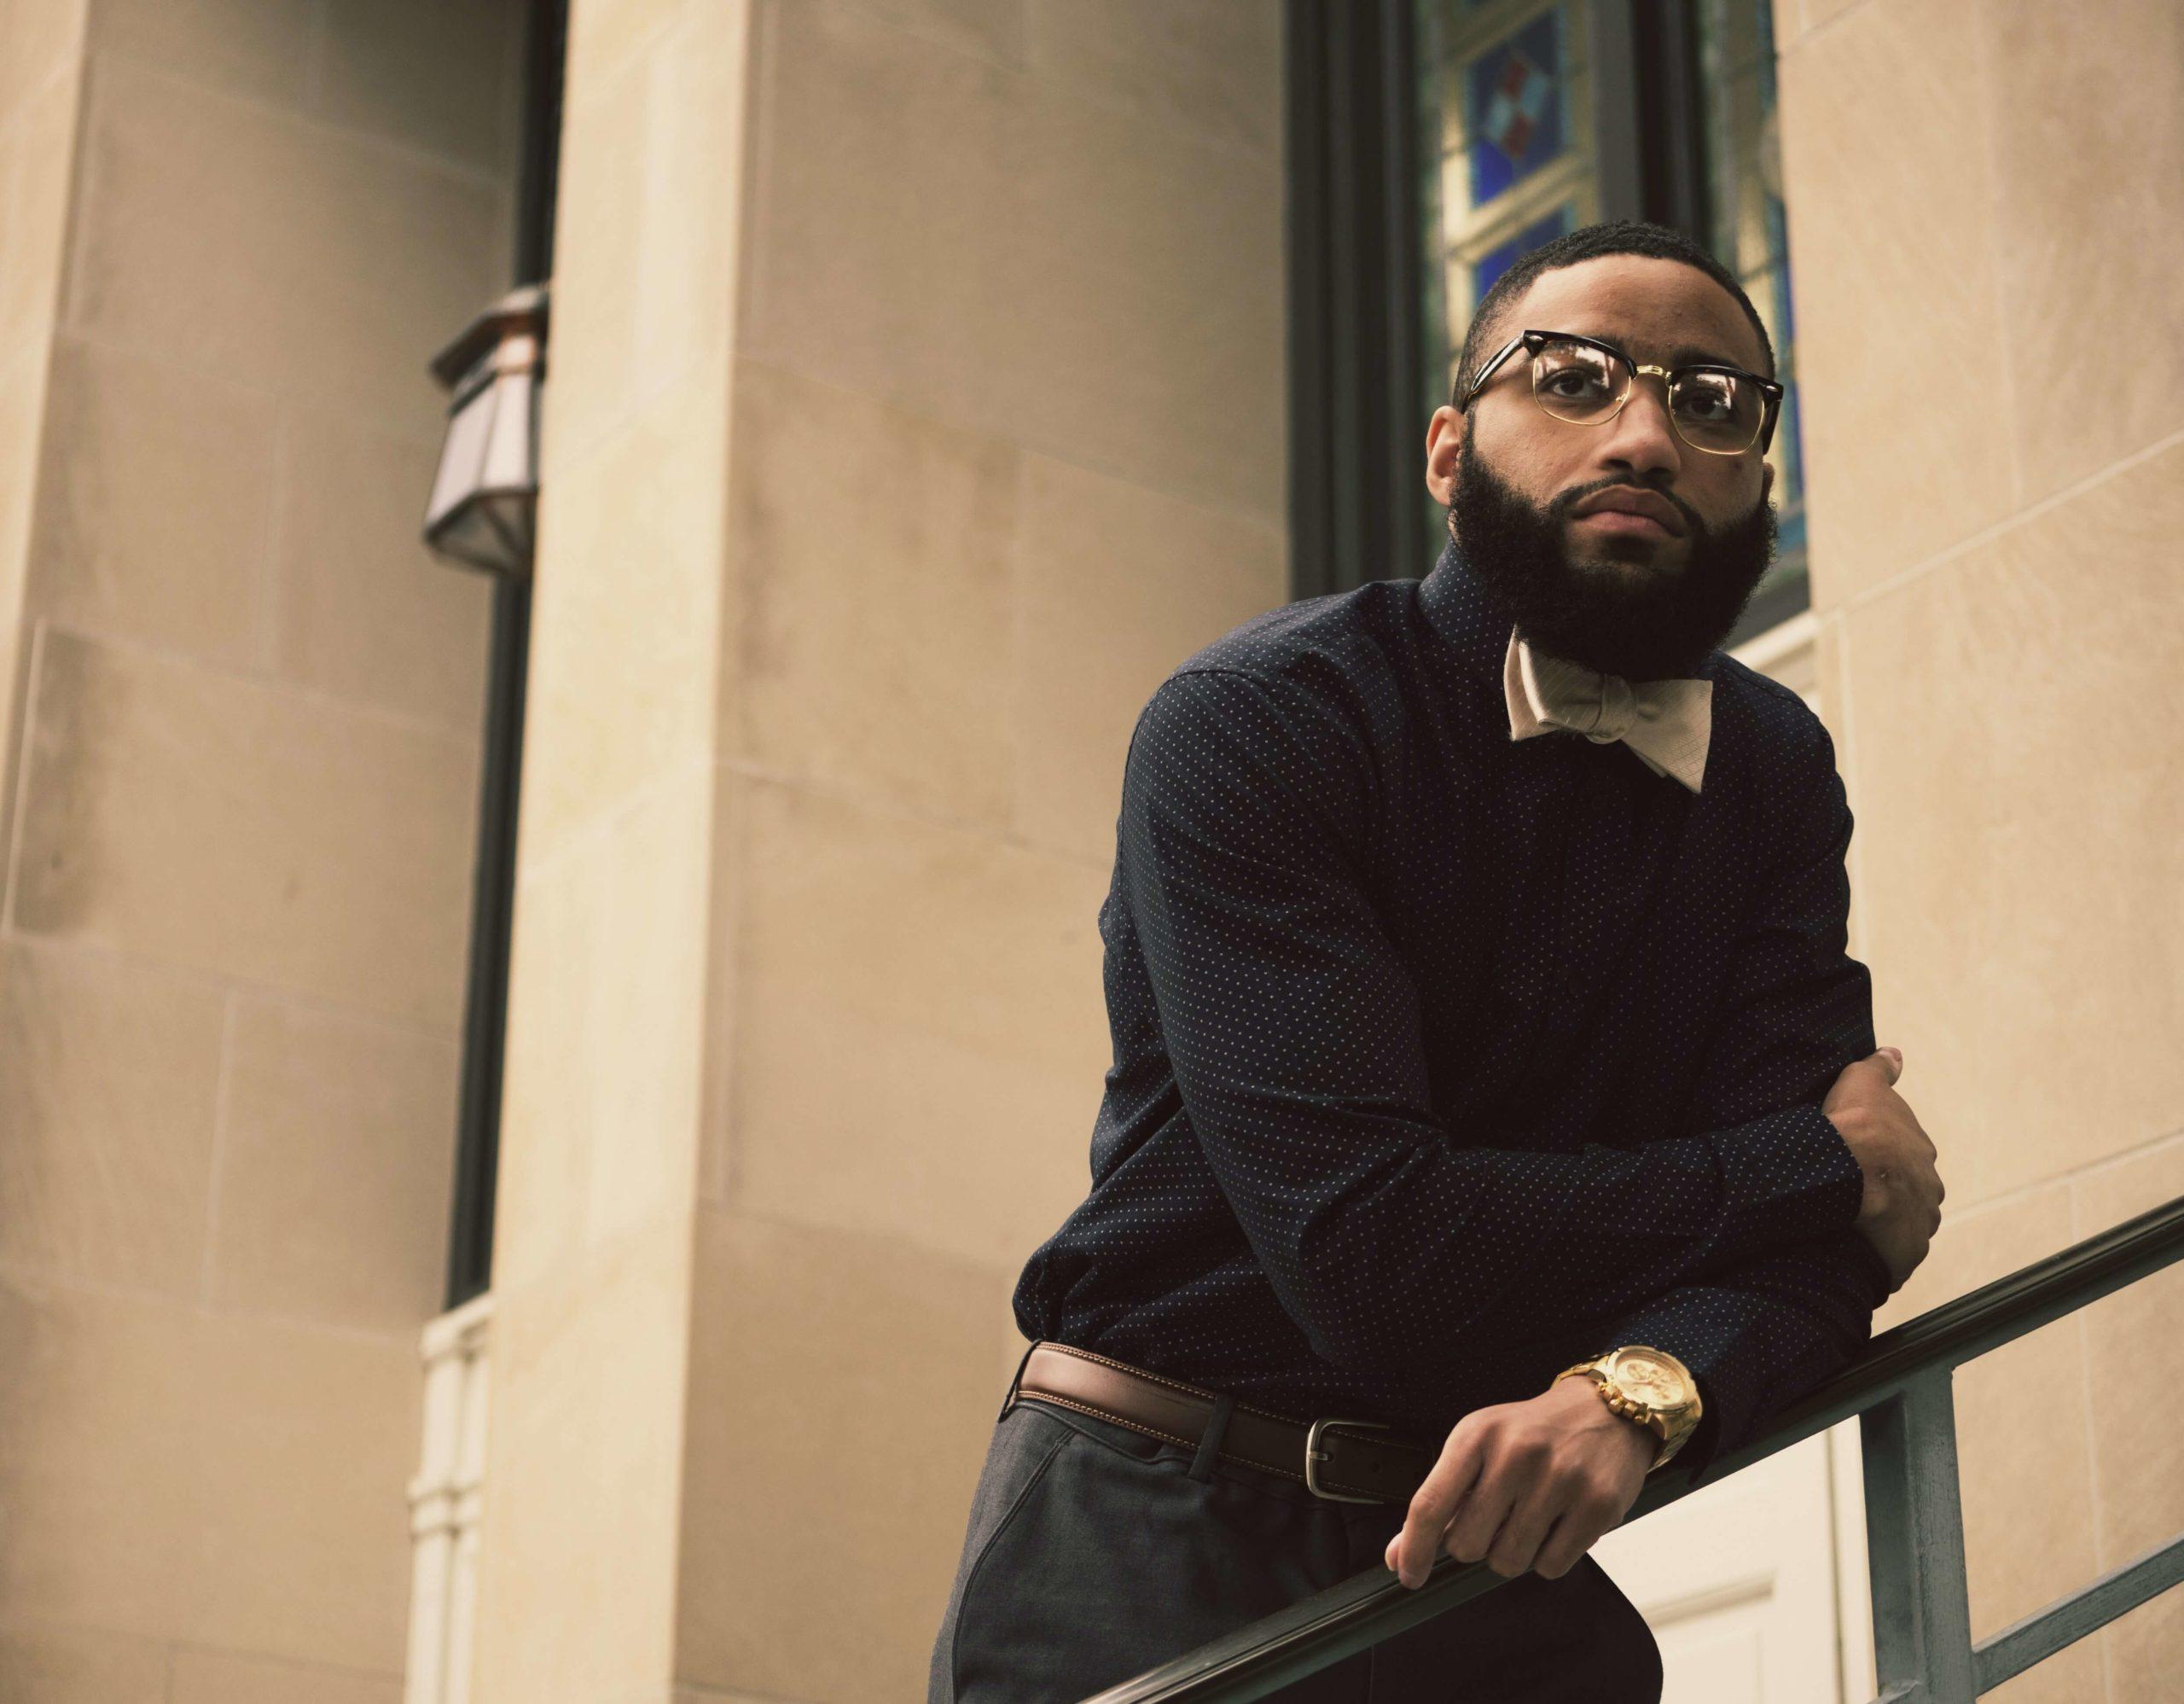 Black Men Experience More Prostate Cancer Treatment Regret